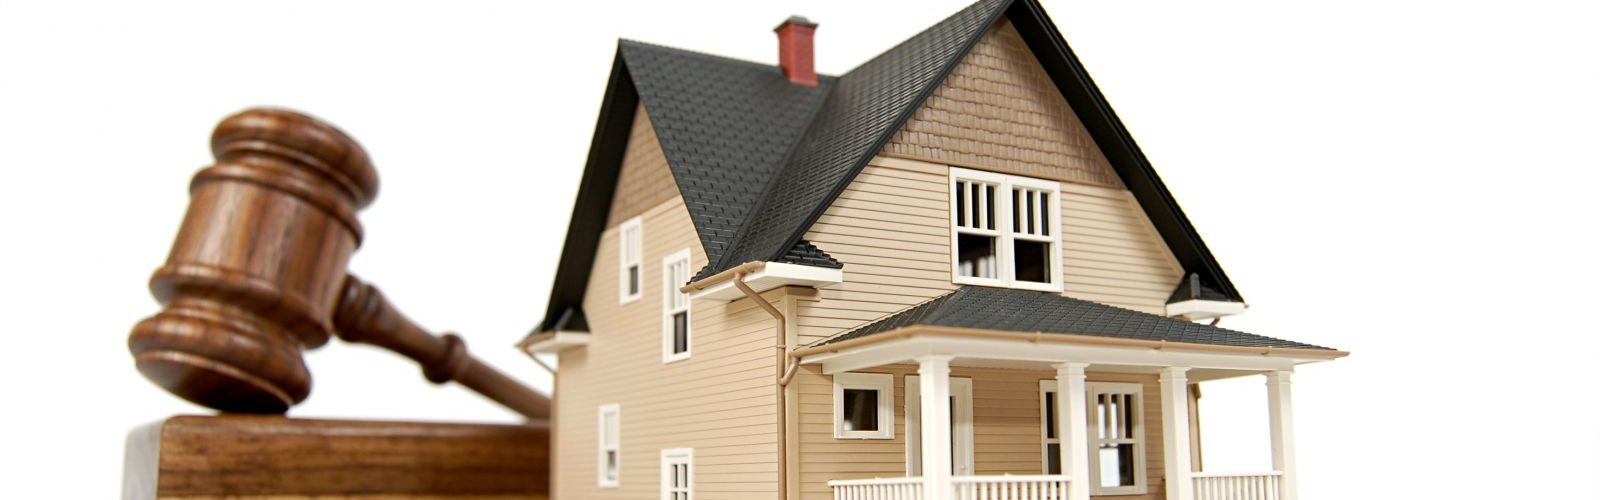 Юрист и адвокат по ипотеке и ипотечному кредитованию